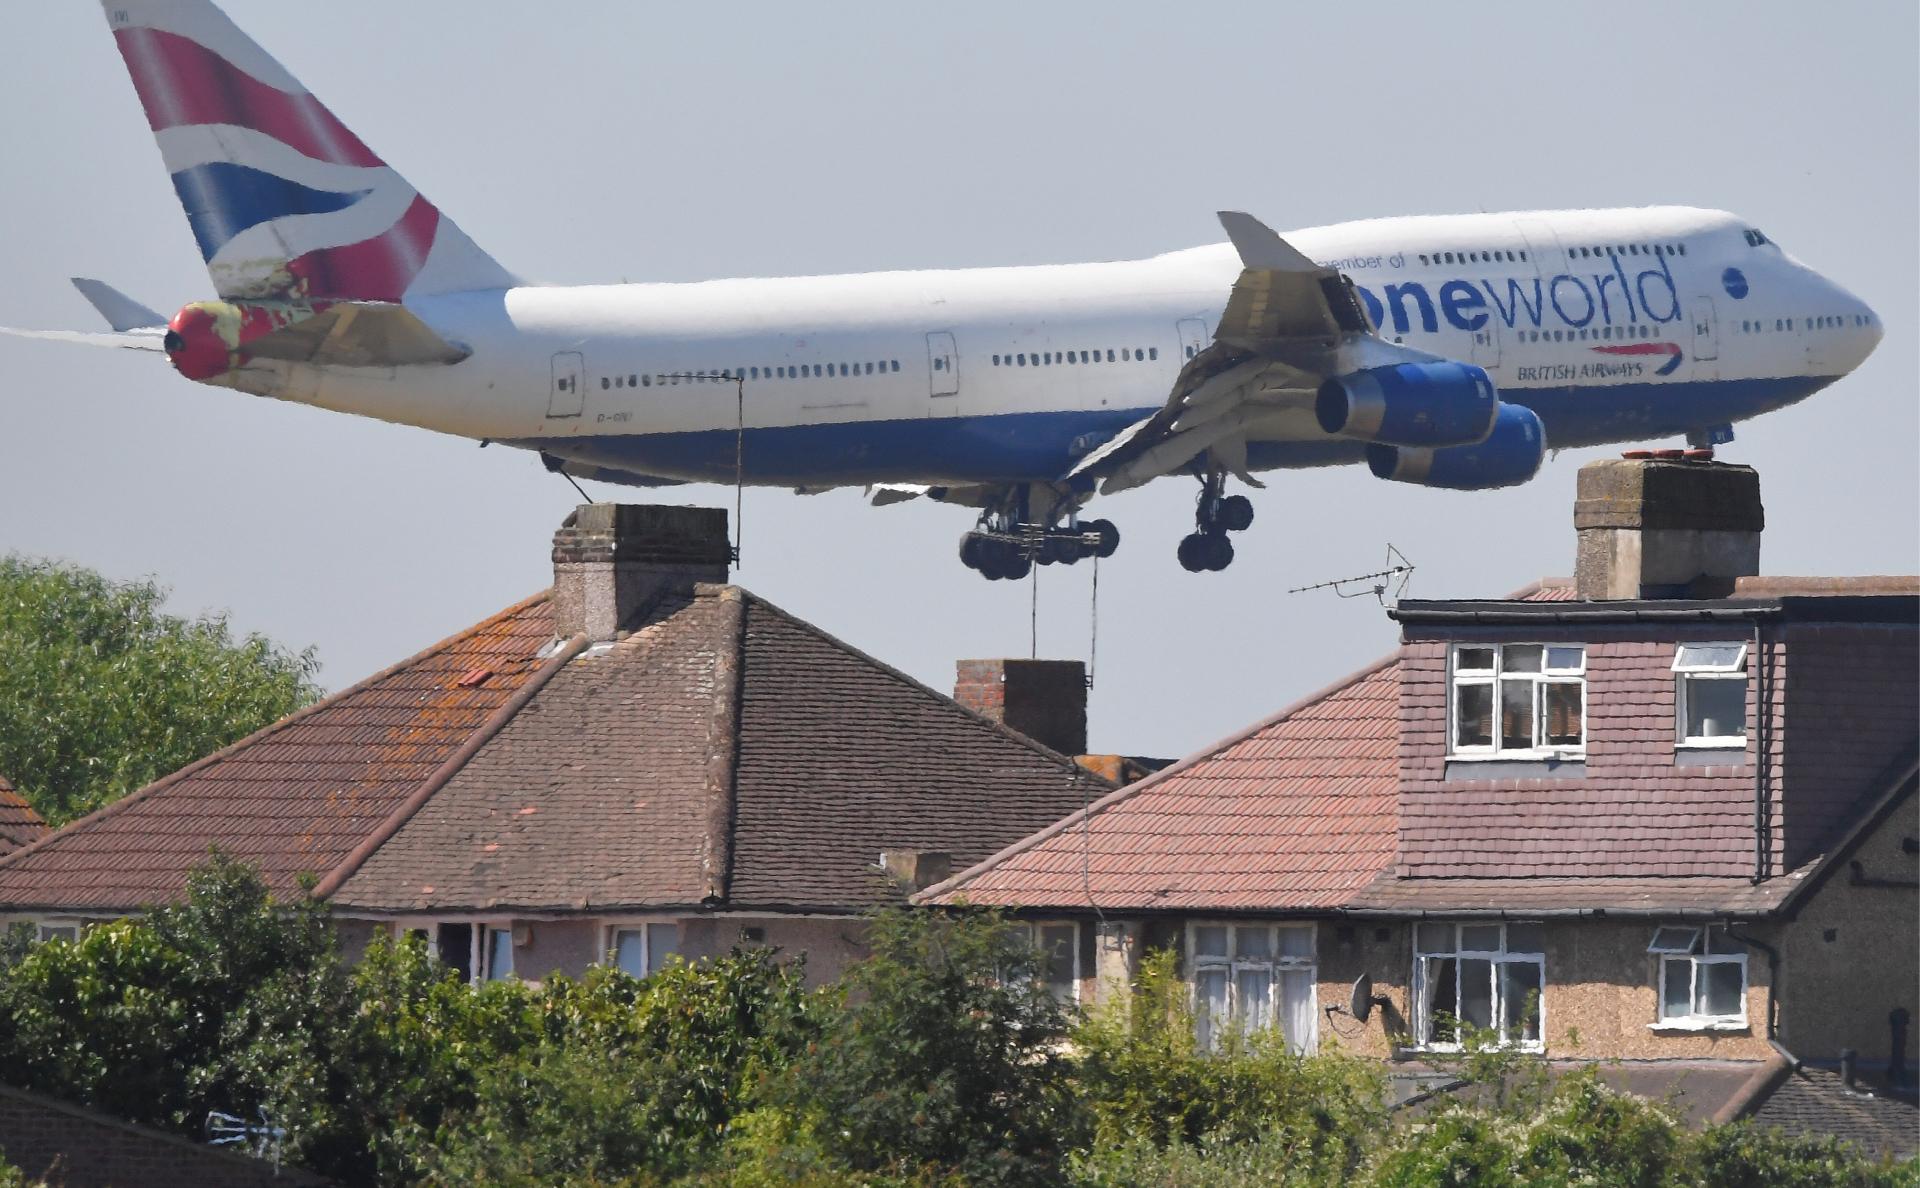 Самолет, заходящий на посадку в аэропорт Хитроу